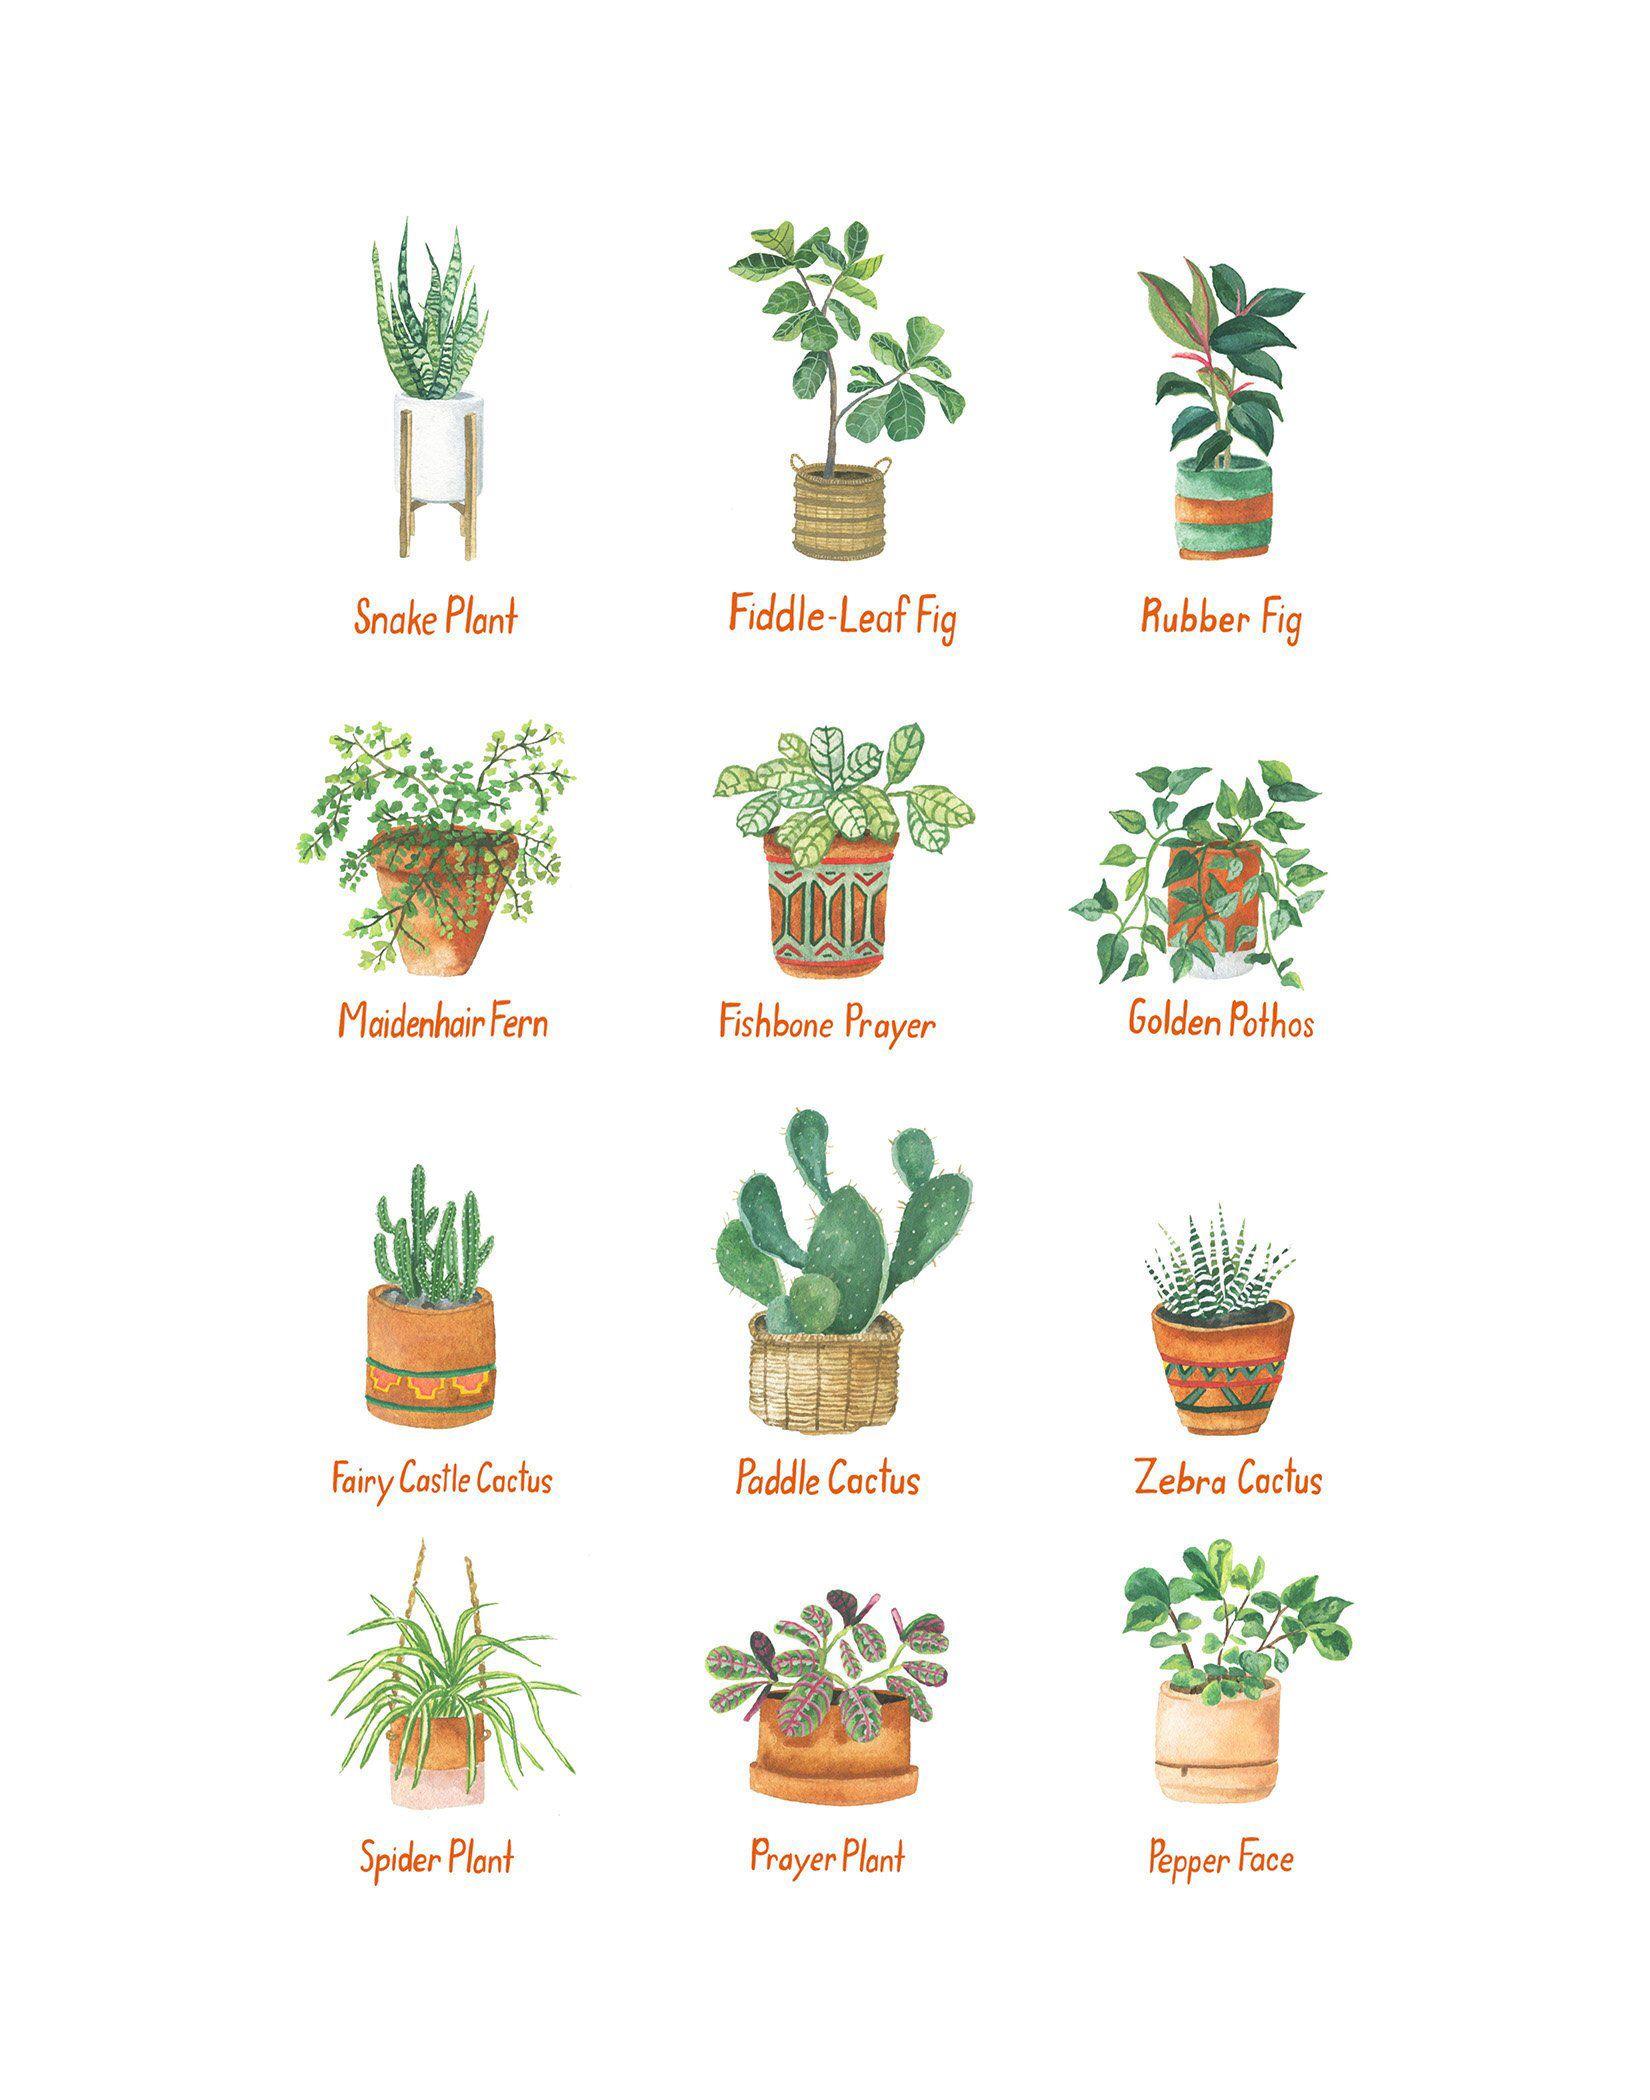 House Plants 11x14 Print Etsy Plants, House plants